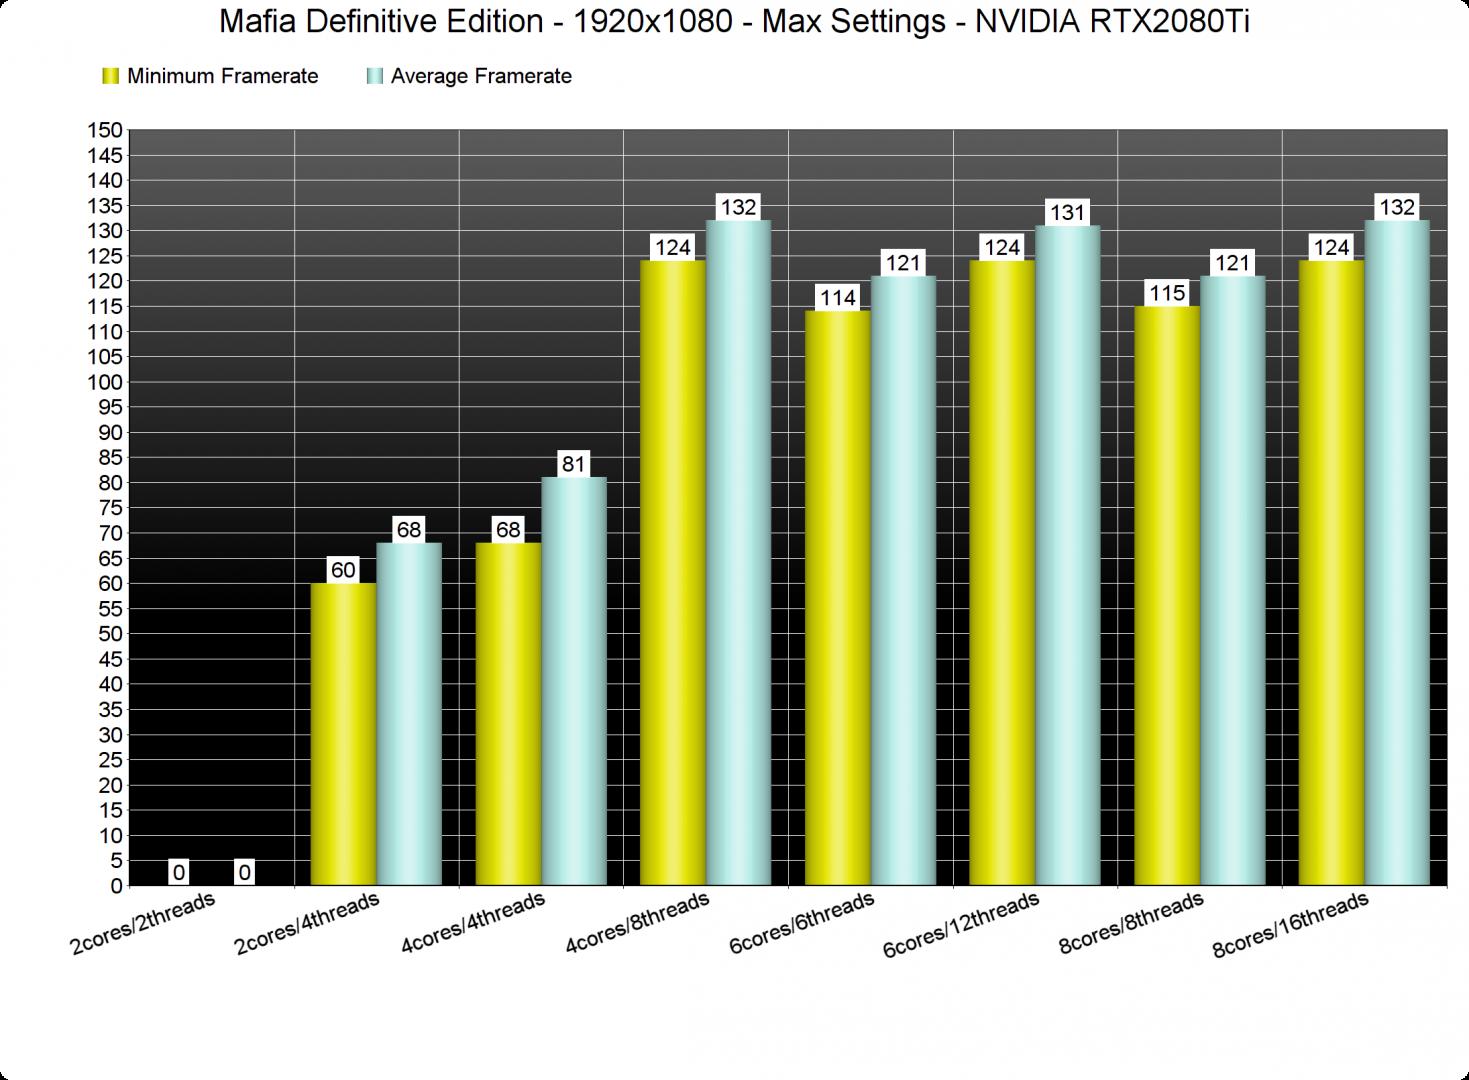 Mafia Definitive Edition CPU benchmarks-1